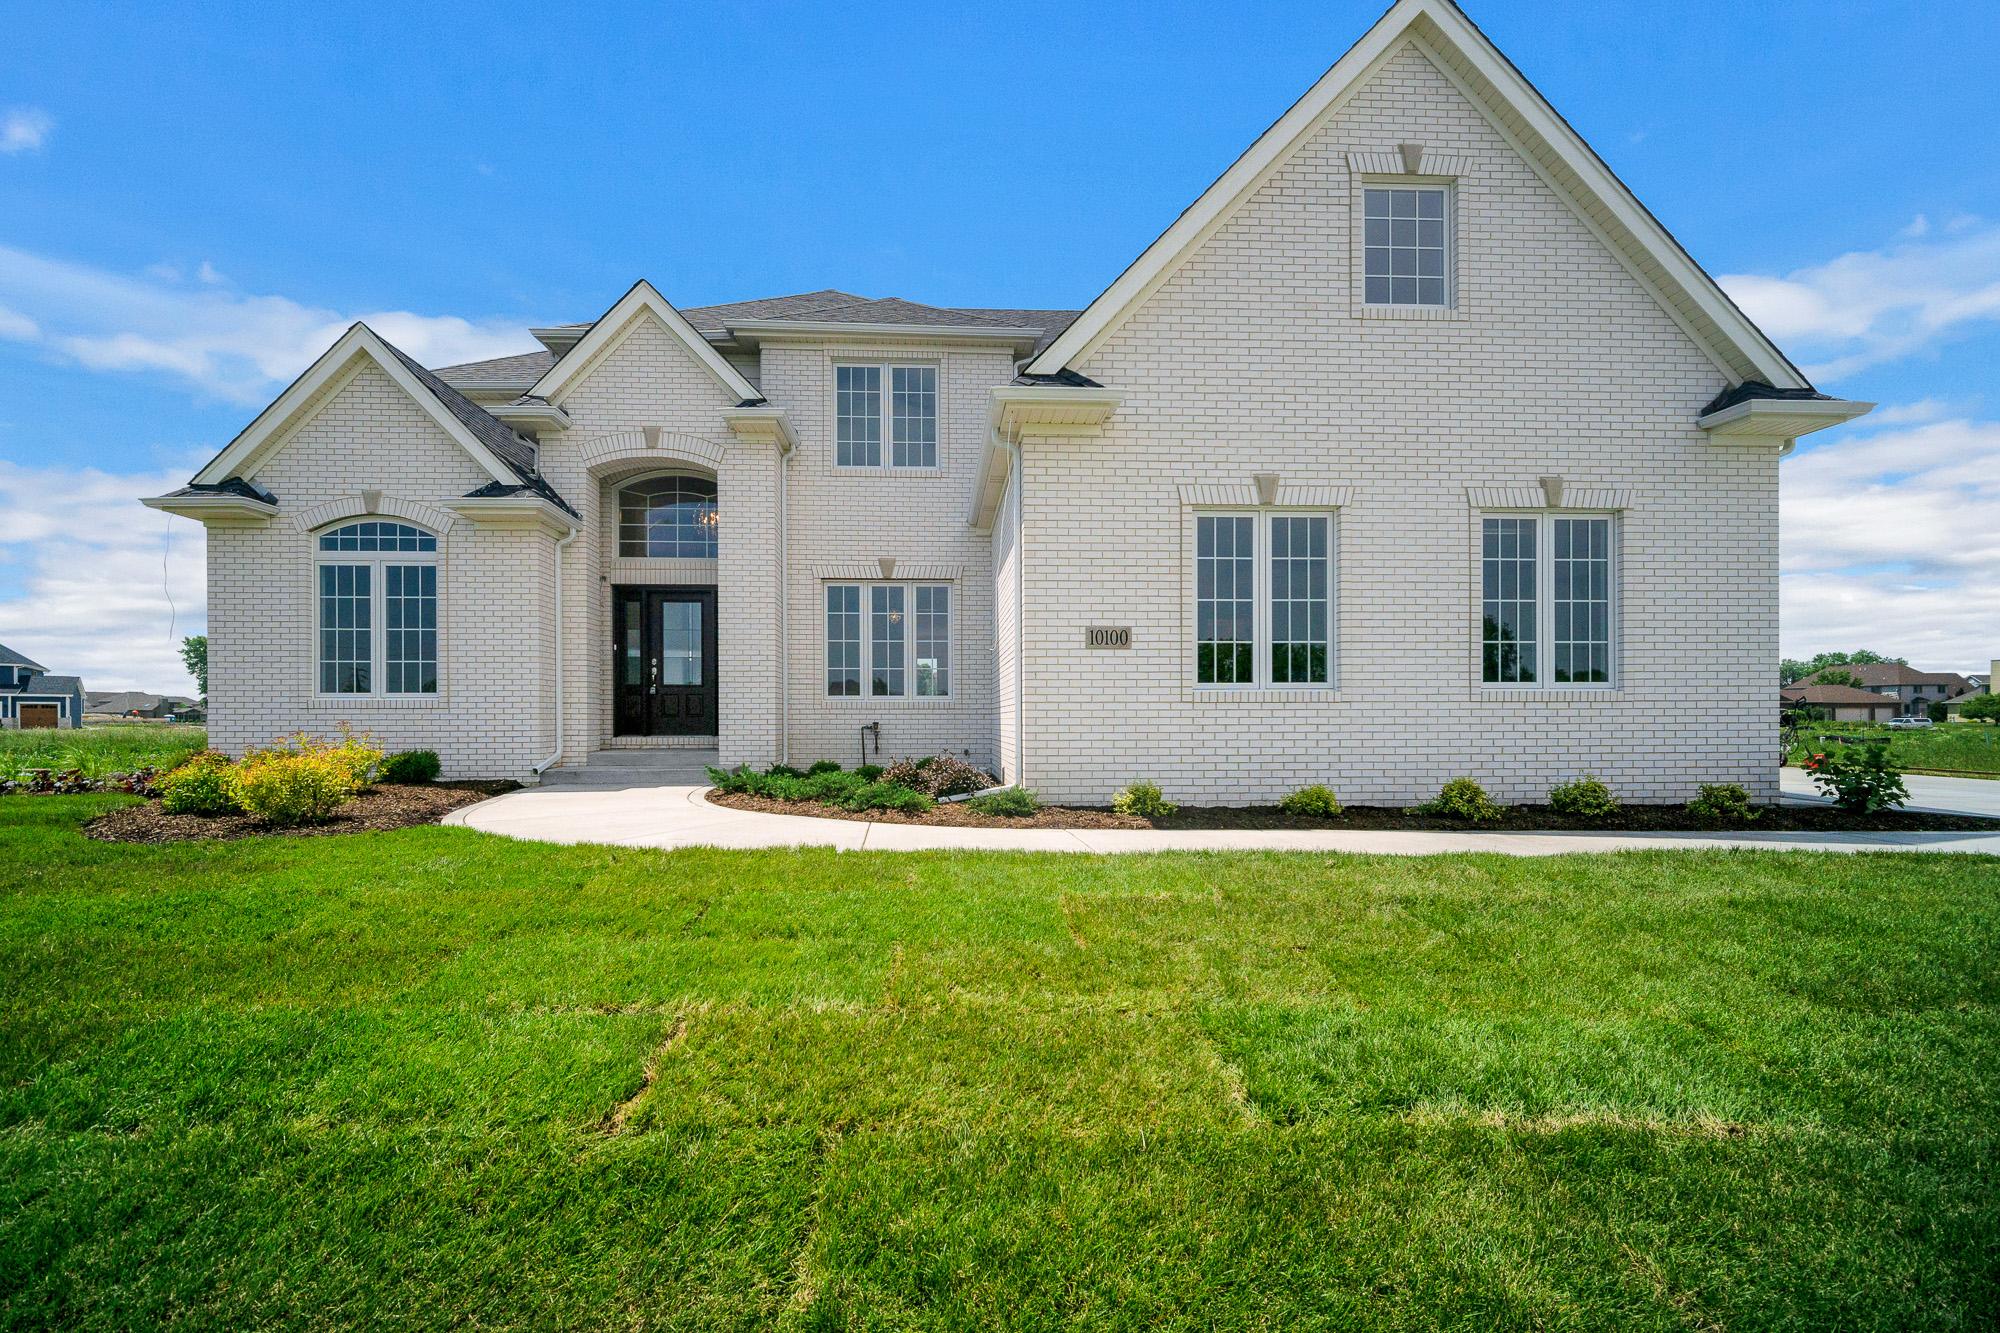 Exterior-house-2